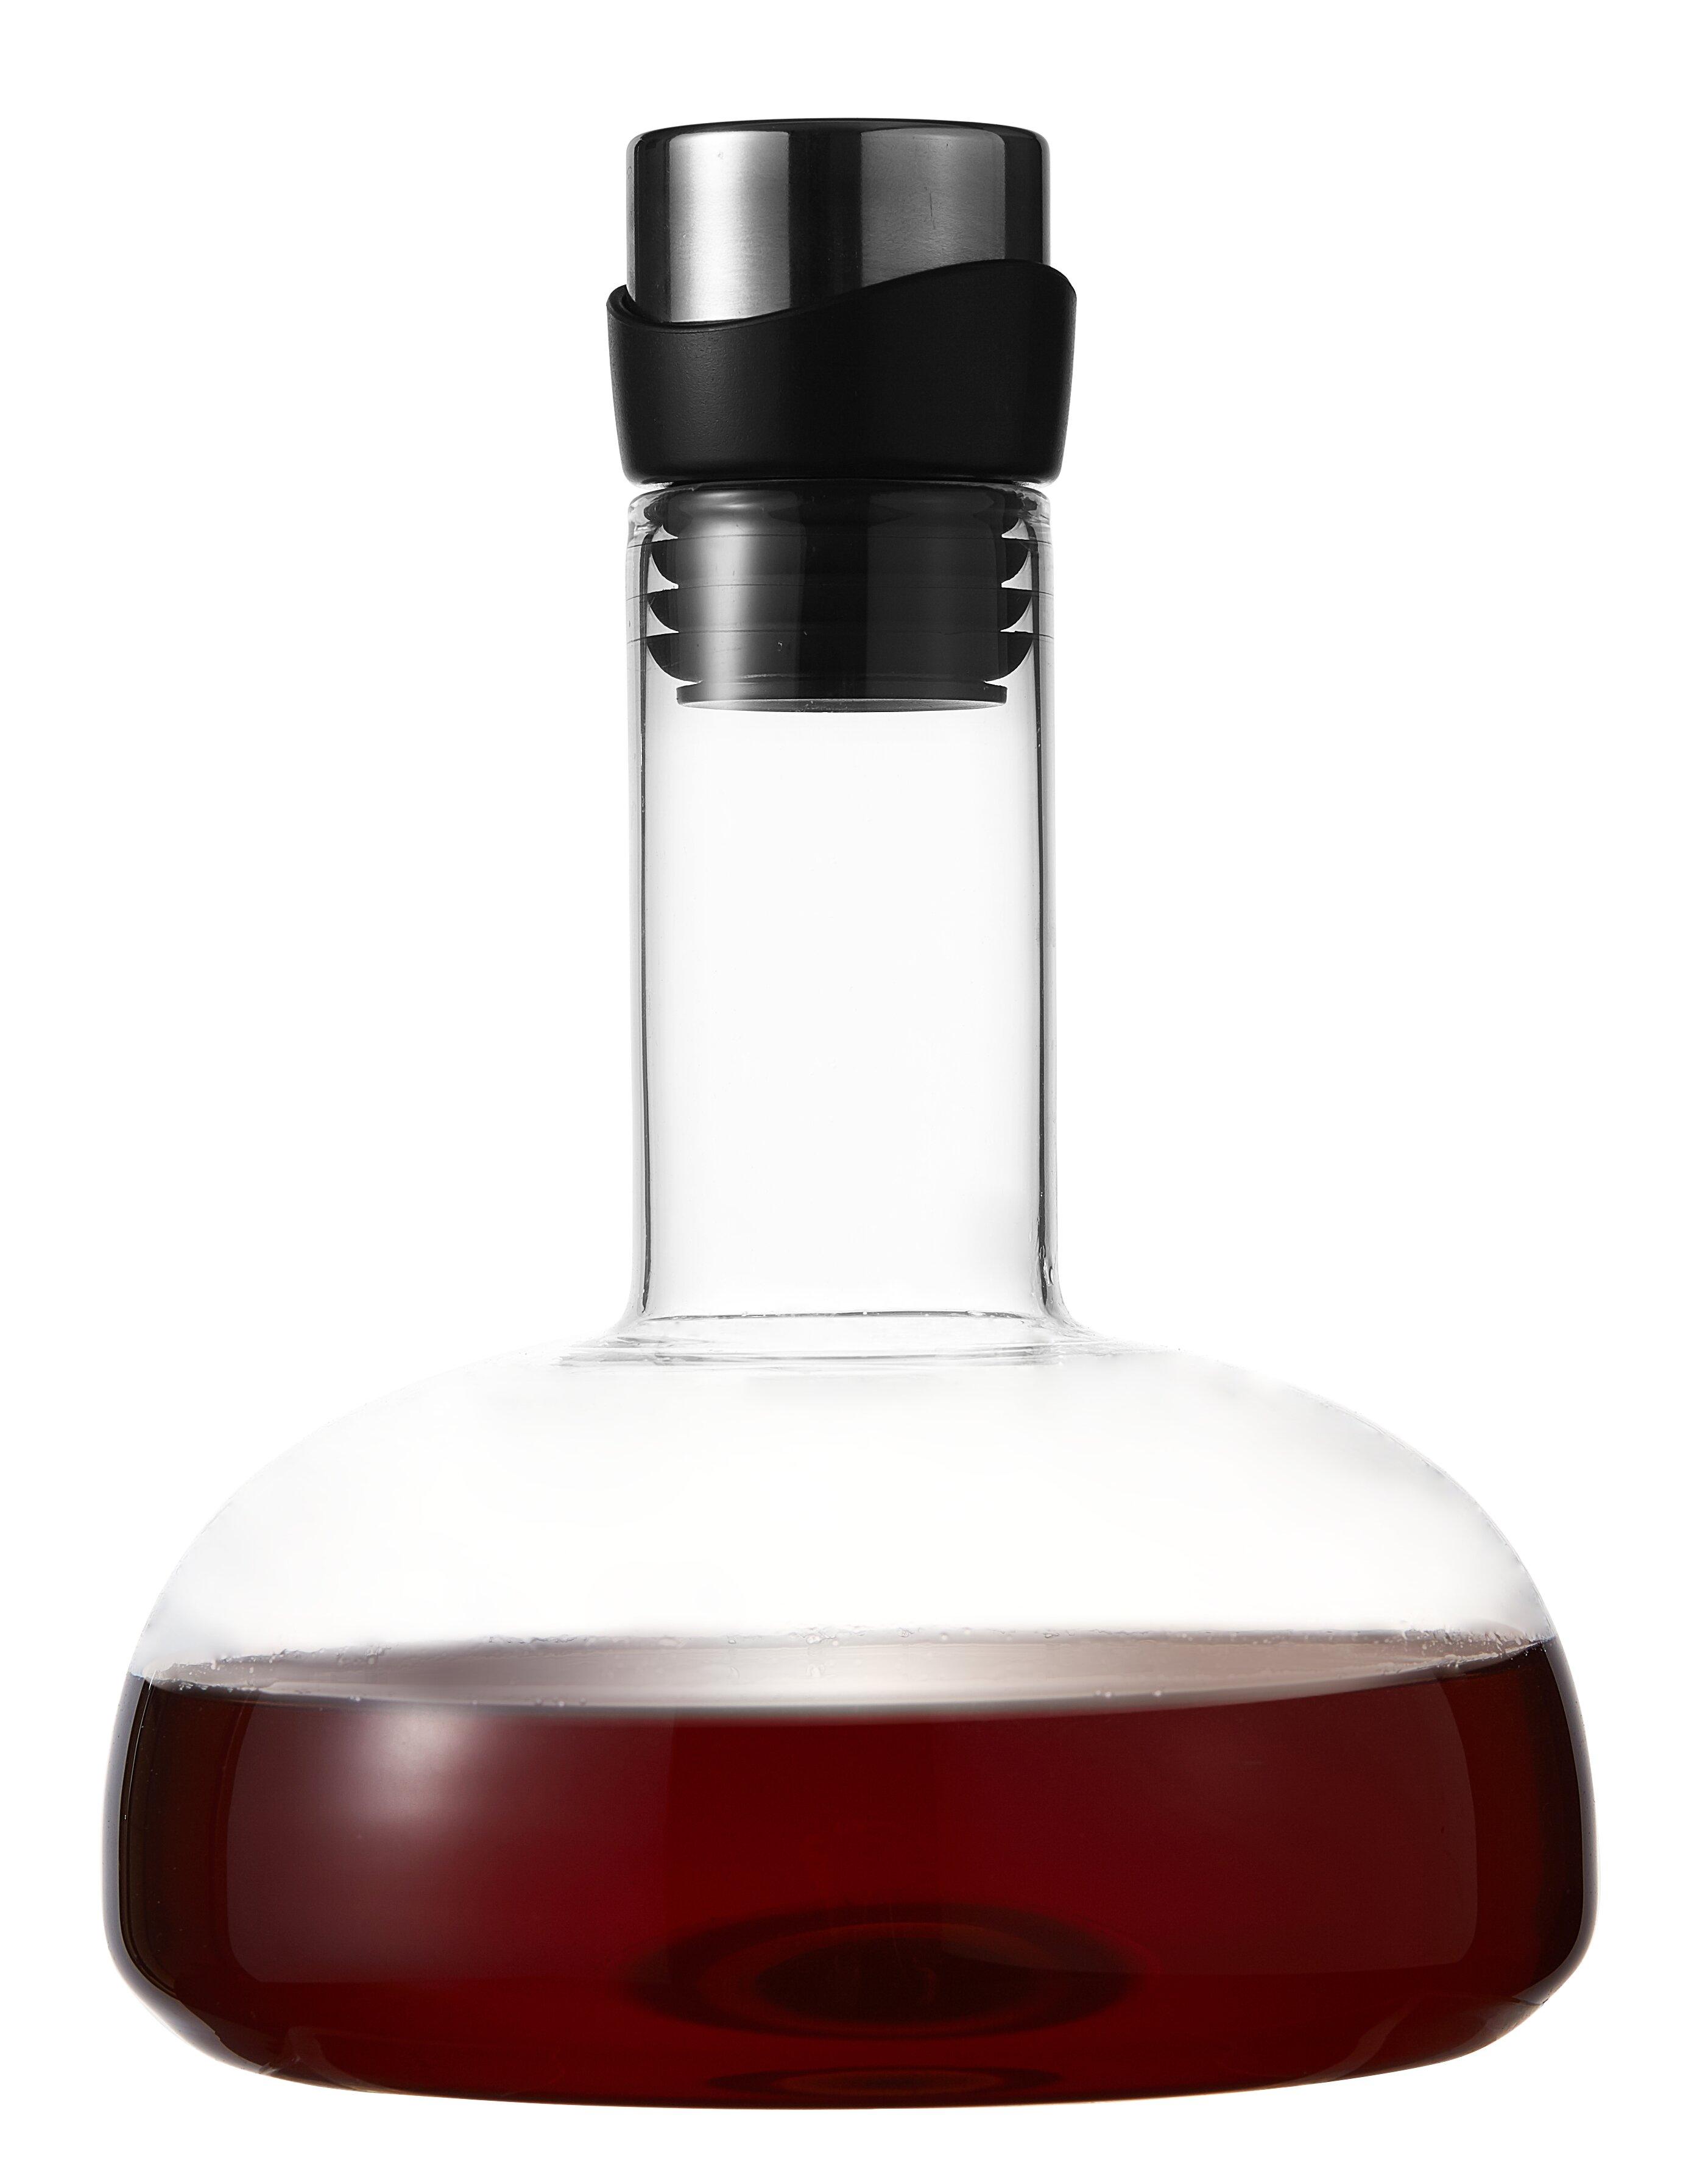 Ebern Designs Breather Carafe 30 Oz Wine Decanter Wayfair